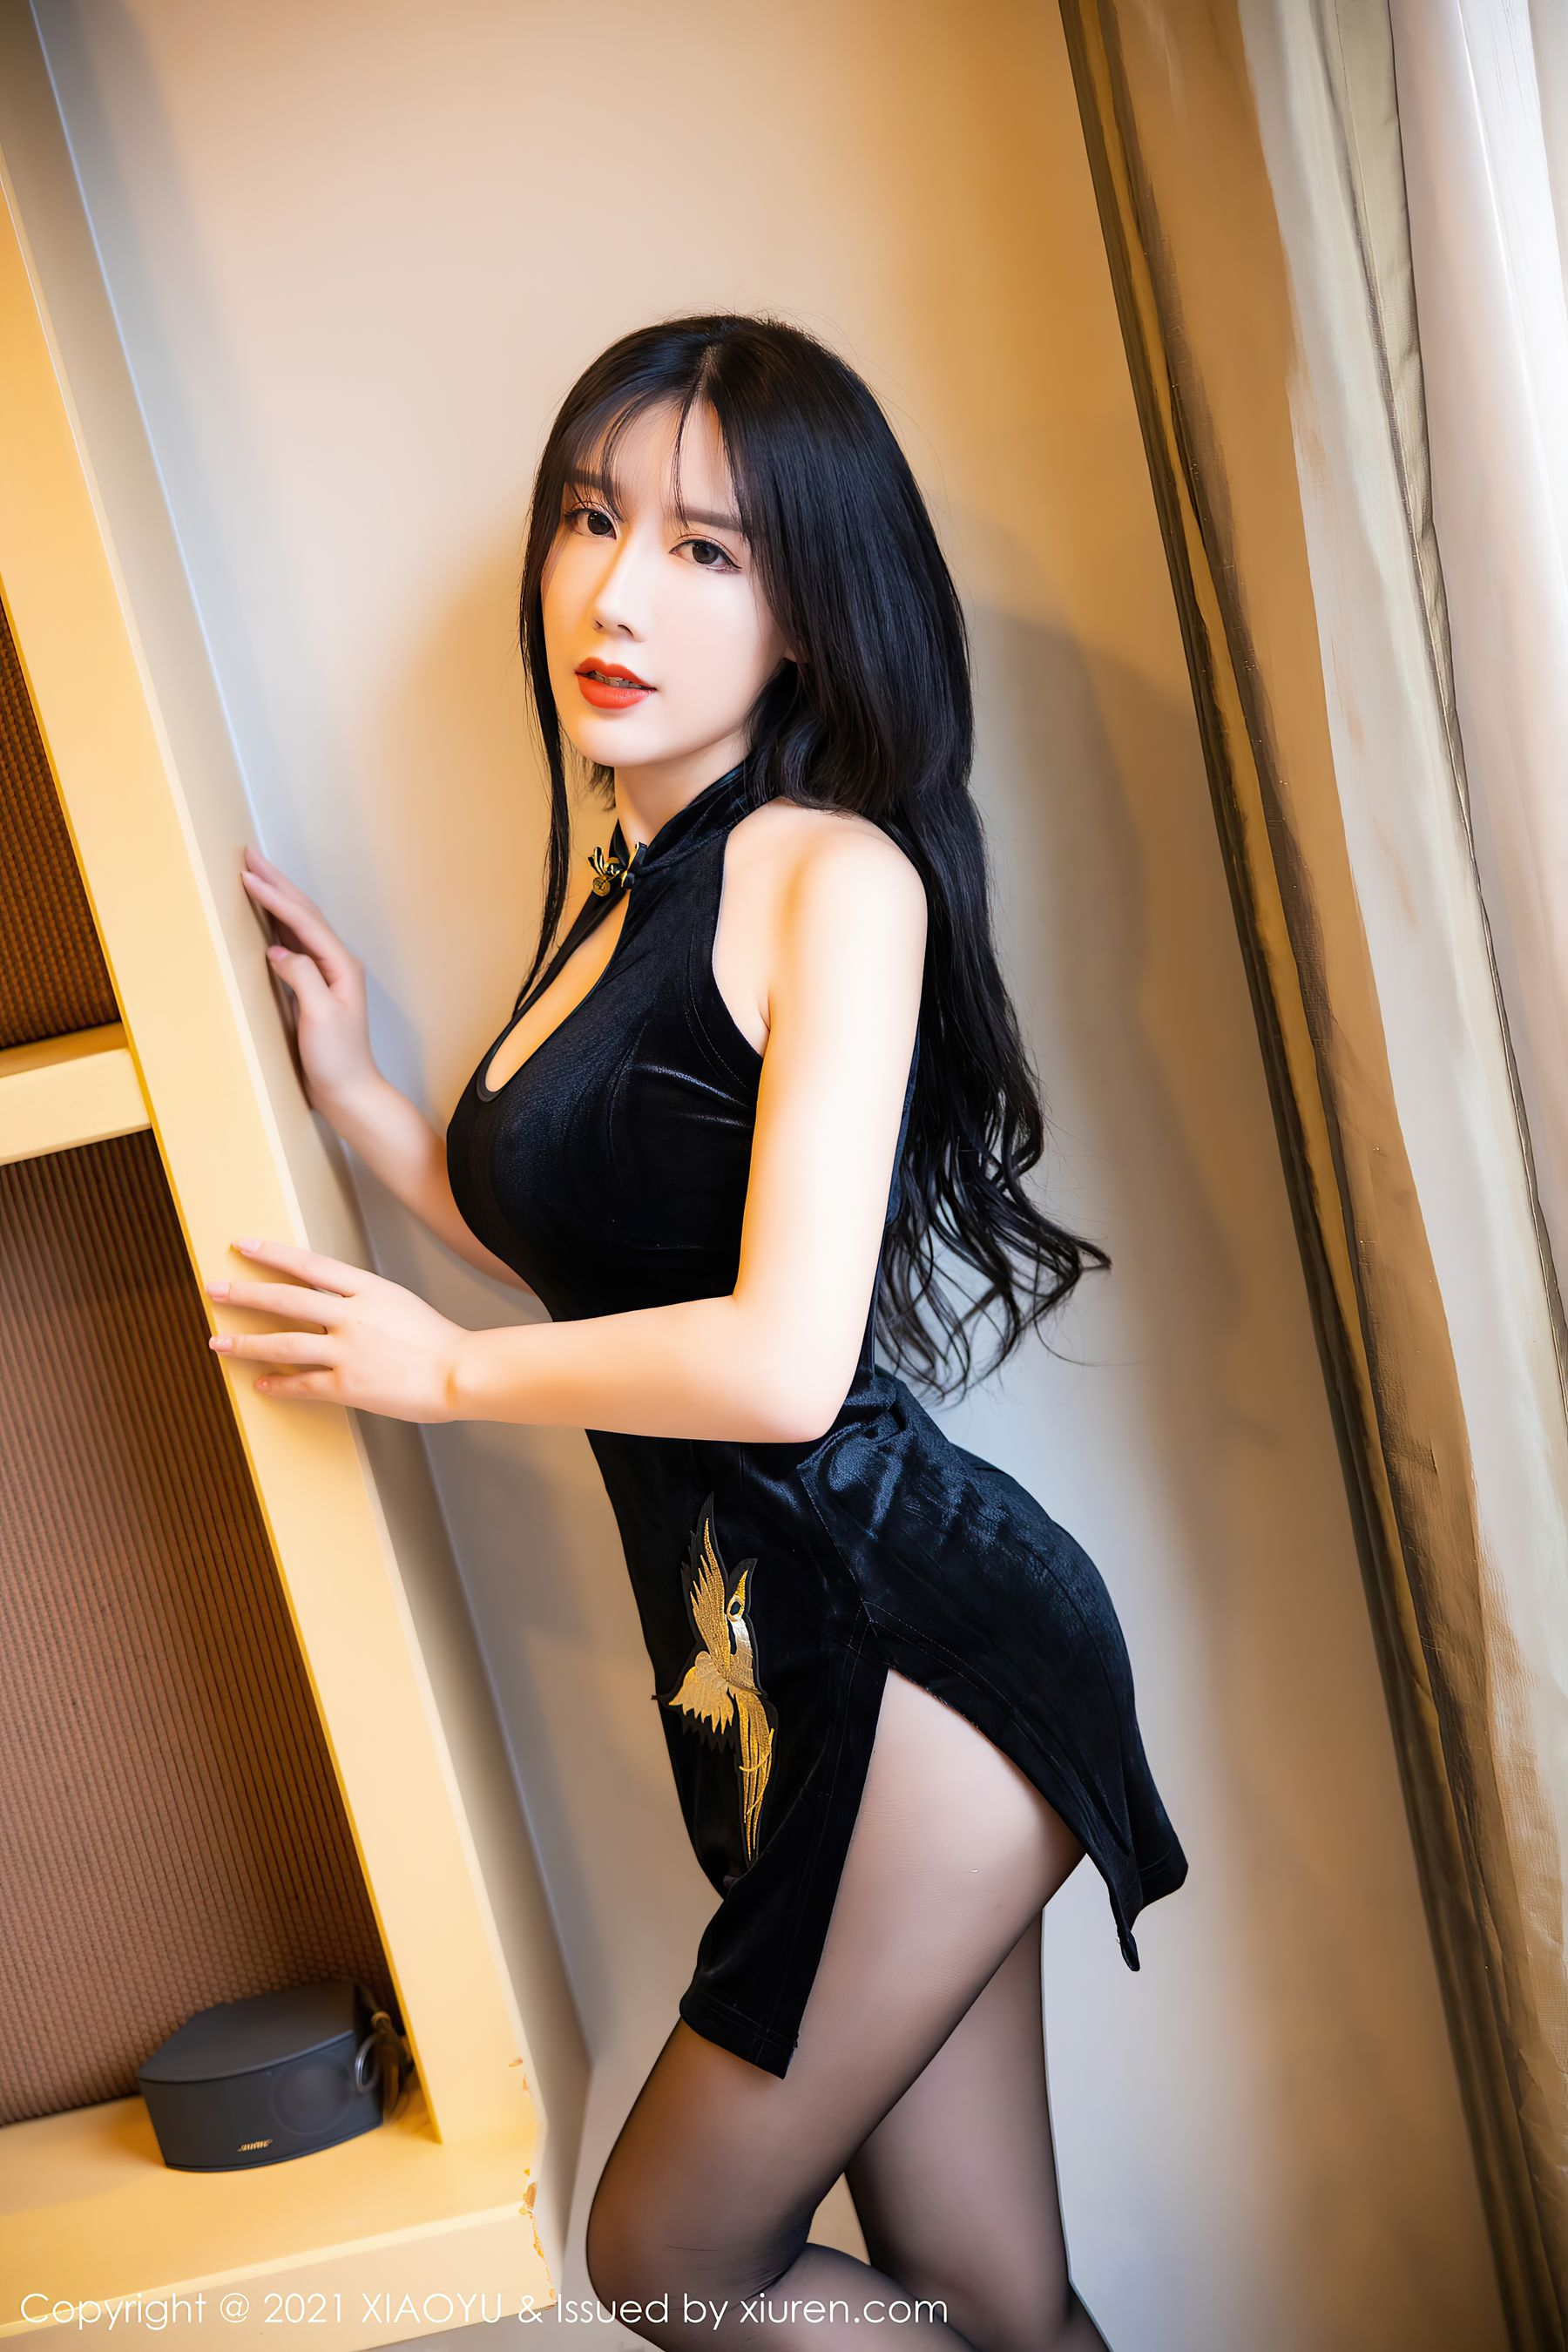 VOL.1758 [语画界]黑丝美腿黑丝制服:陈梦babe(尤果陈梦)超高清写真套图(100P)